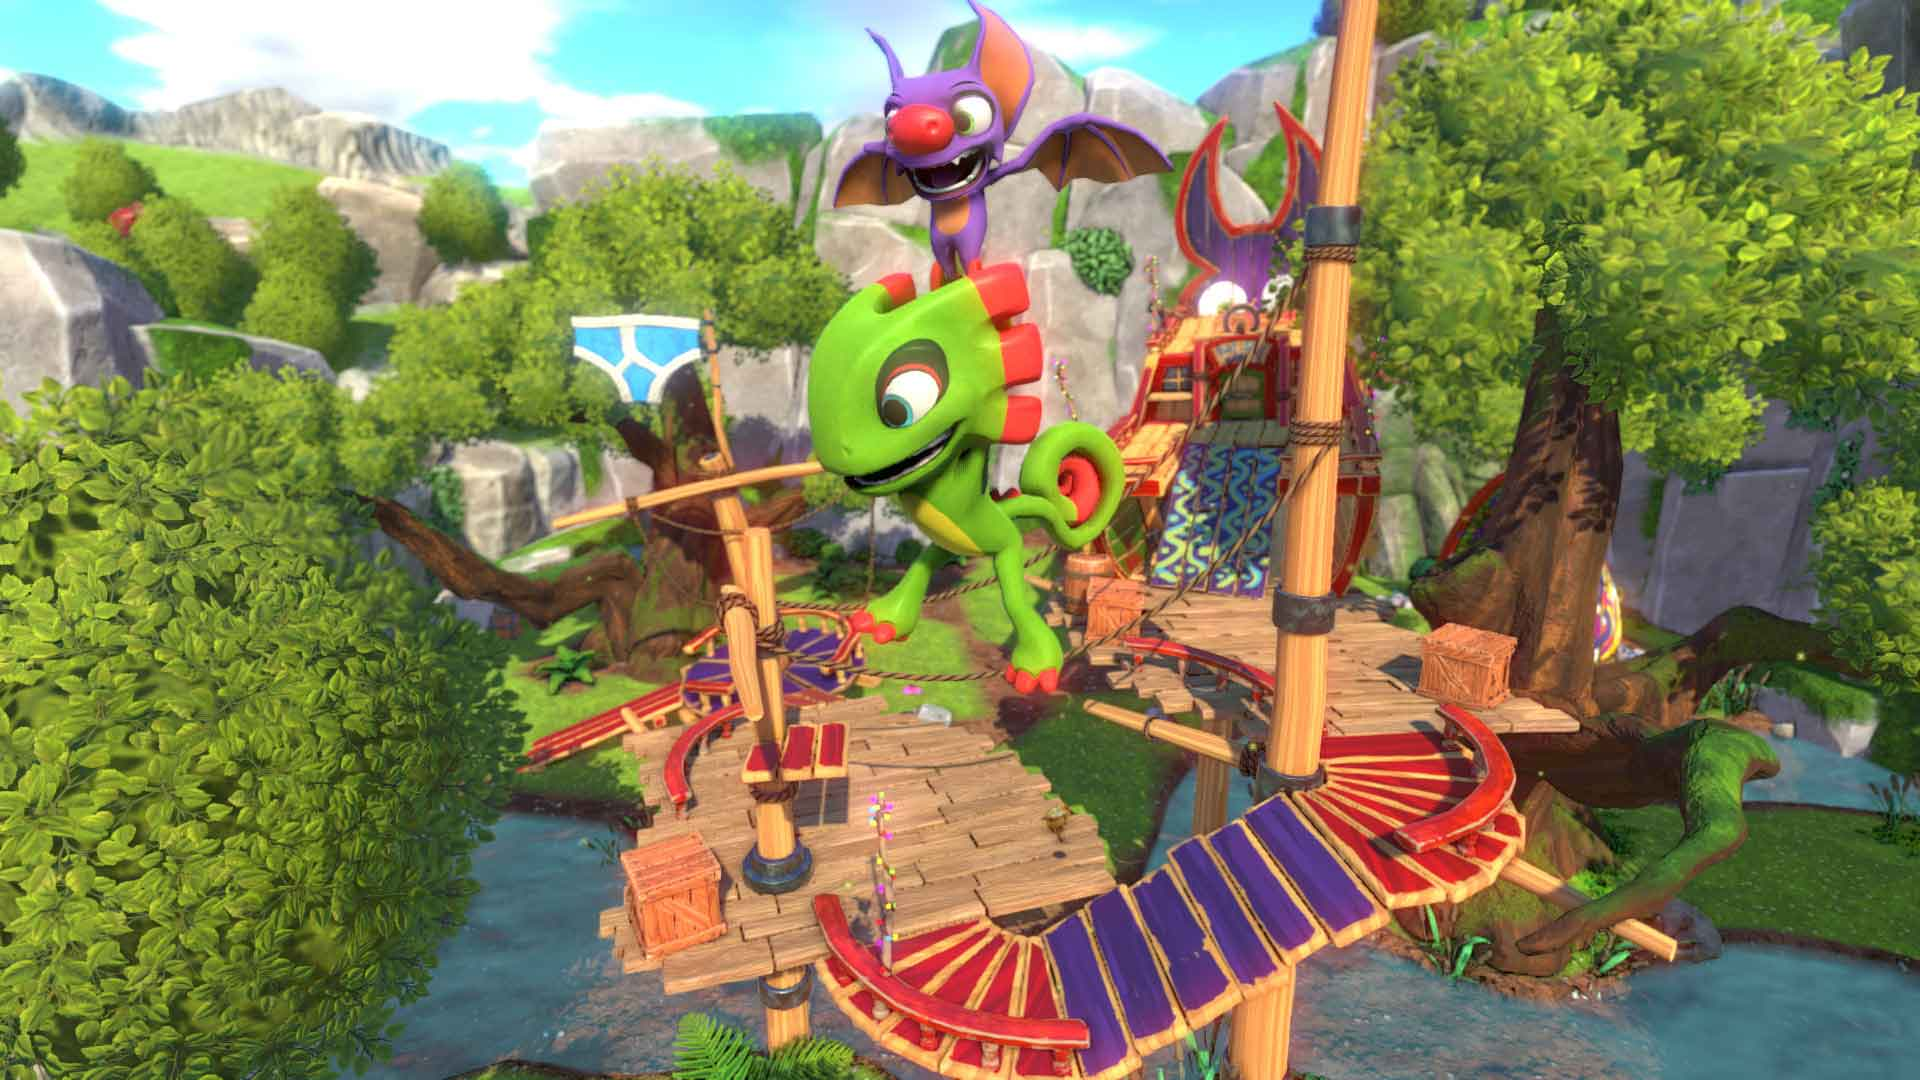 Grant Kirkhope & David Wise Yooka-Laylee Soundtracks Interview